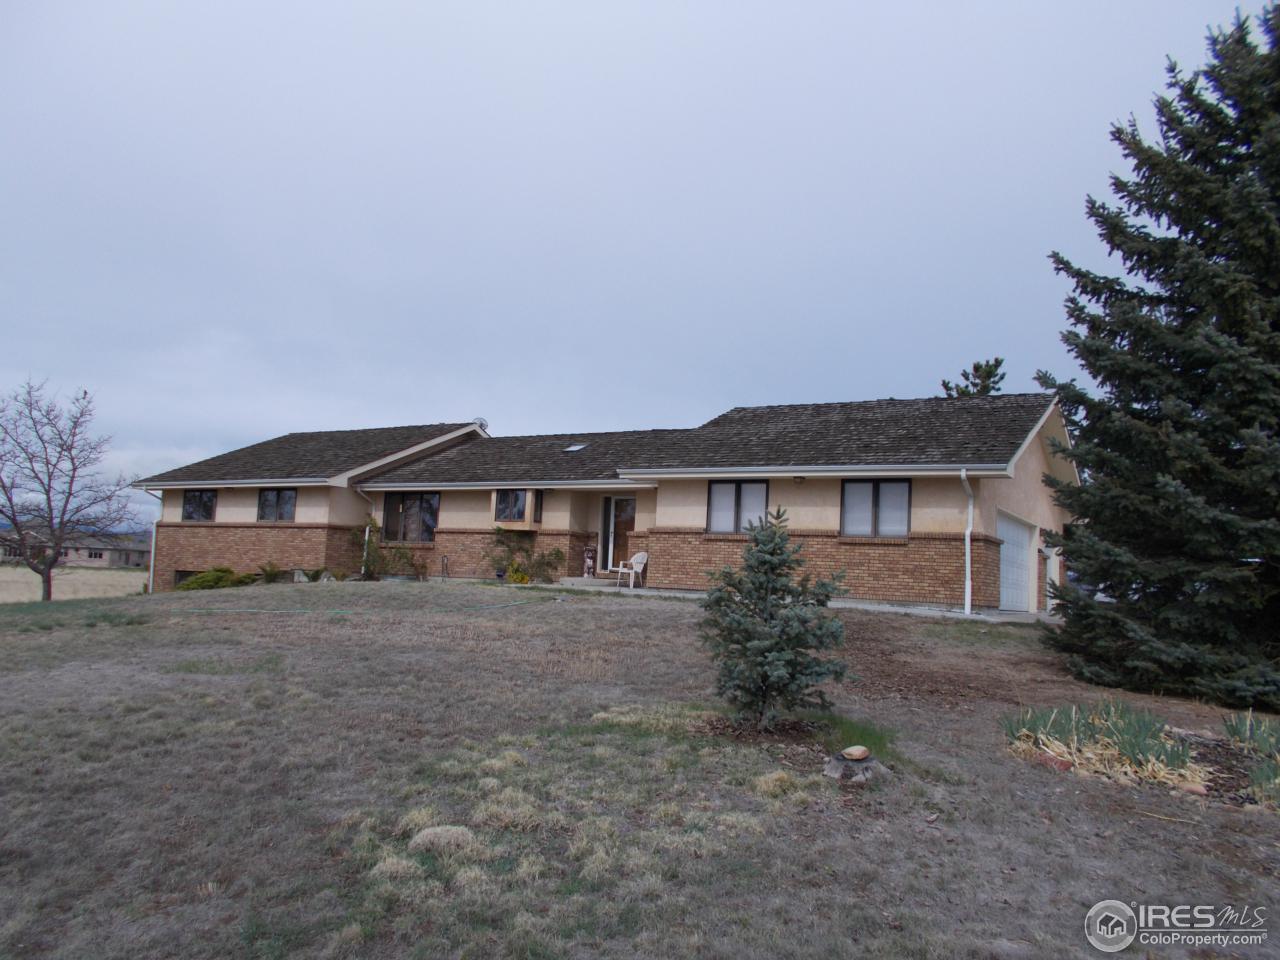 9715 Yellowstone Rd, Longmont, CO 80504